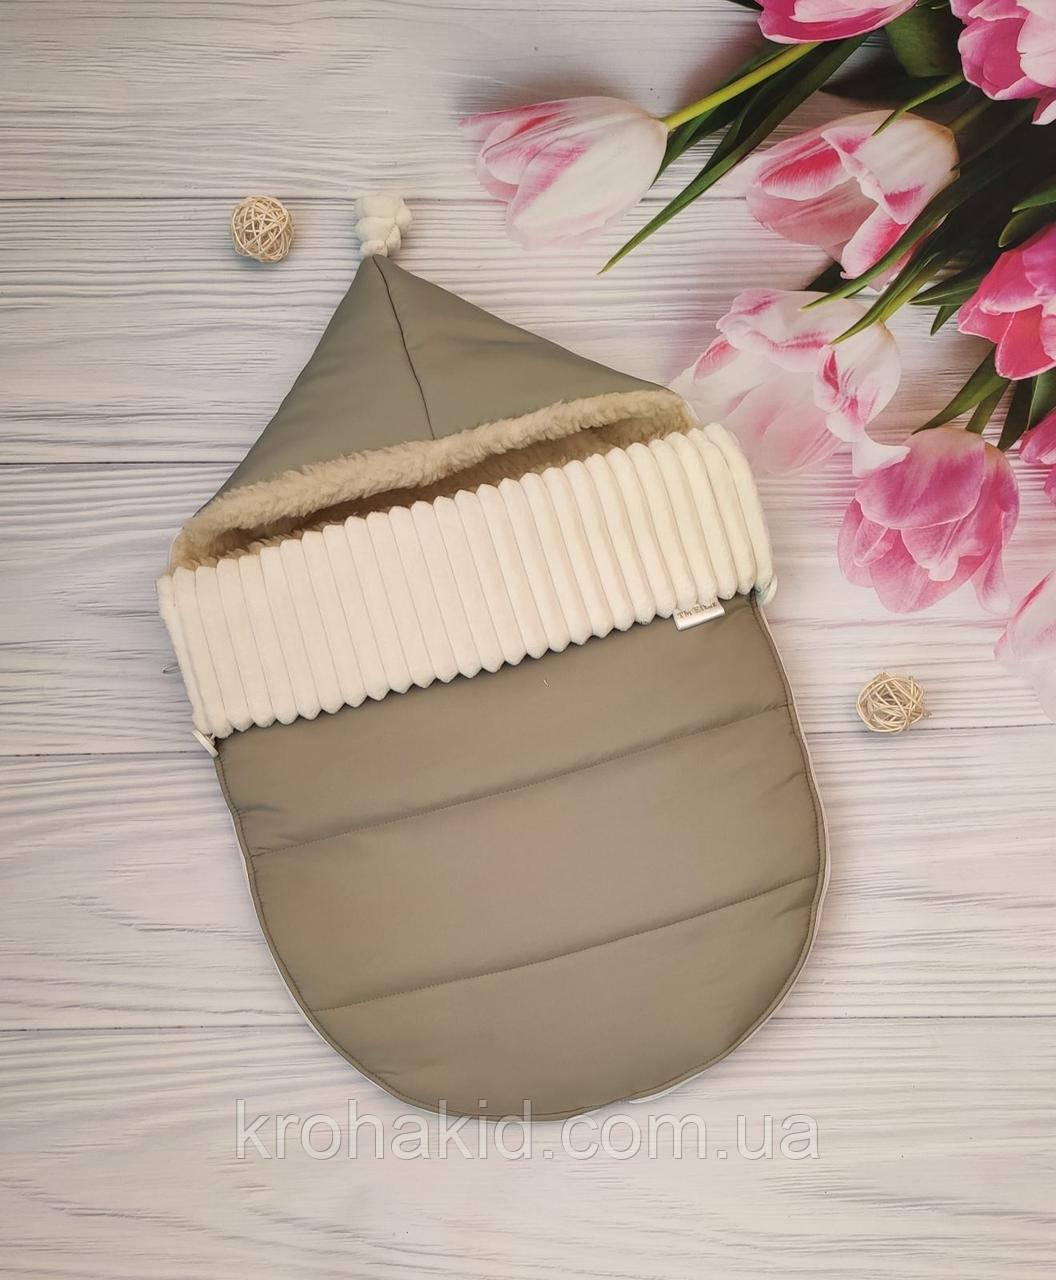 Зимний конверт-чехол на овчине в коляску, чехол в люльку, конверт на выписку / спальник в коляску